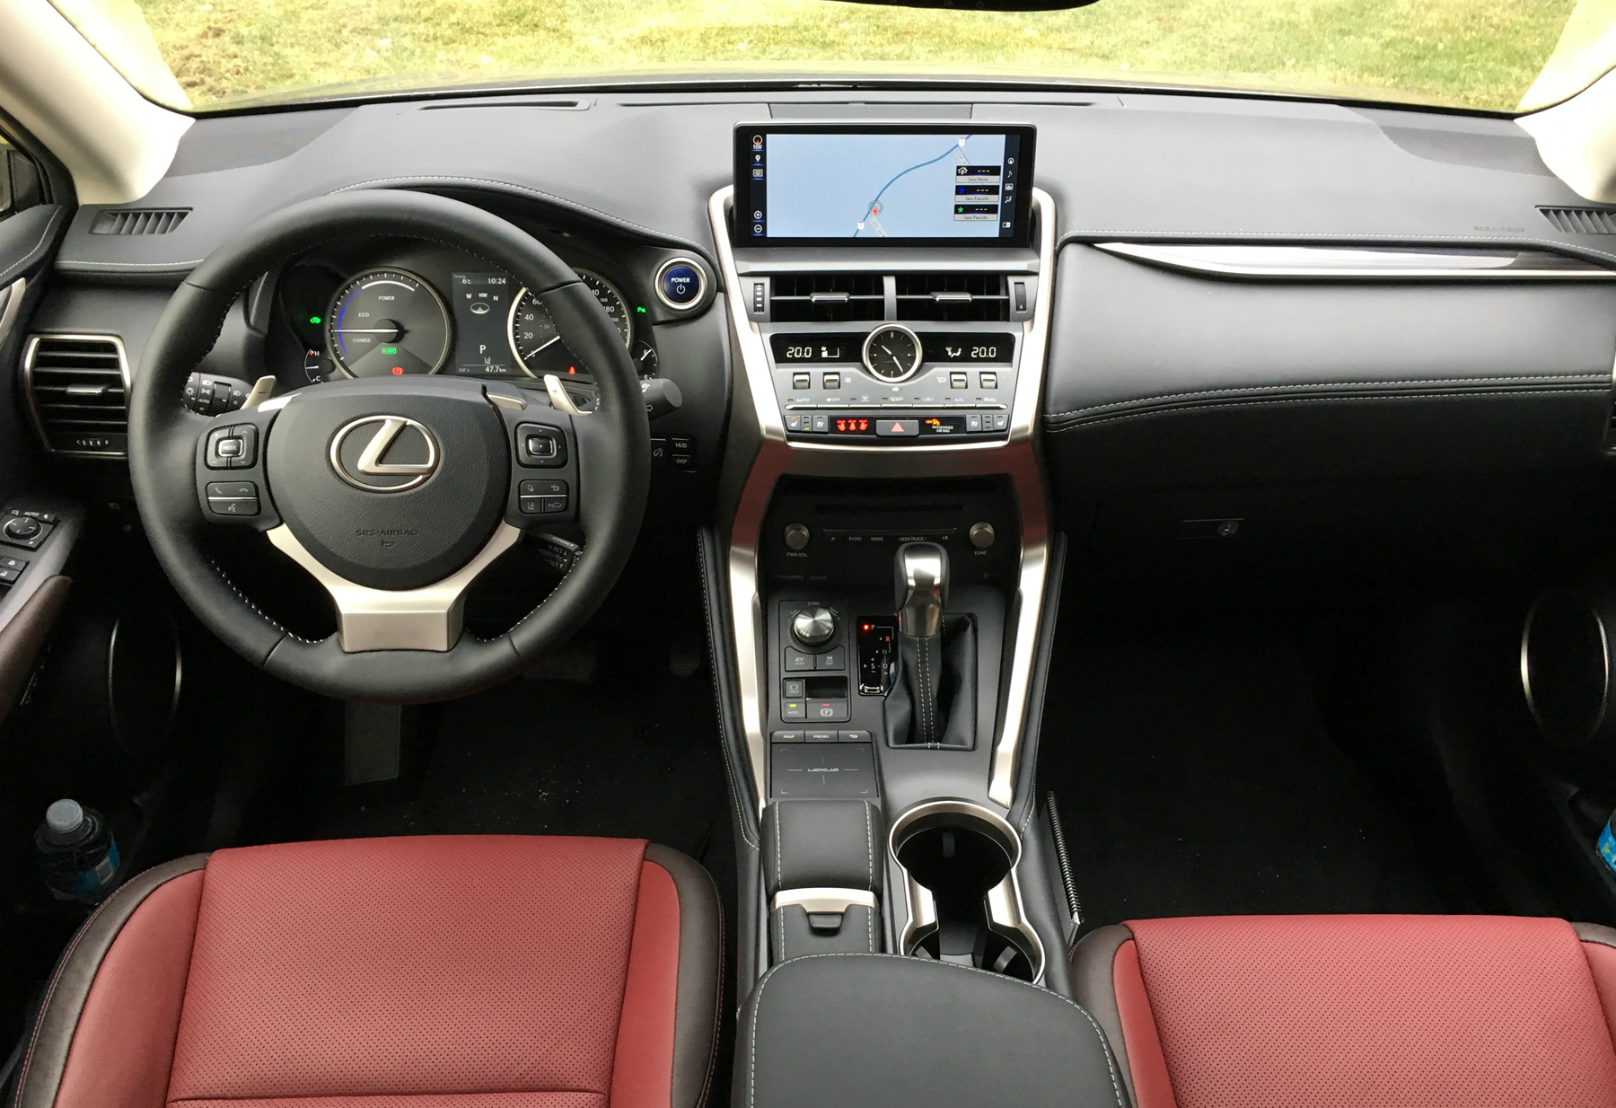 2018 Lexus NX300 Review